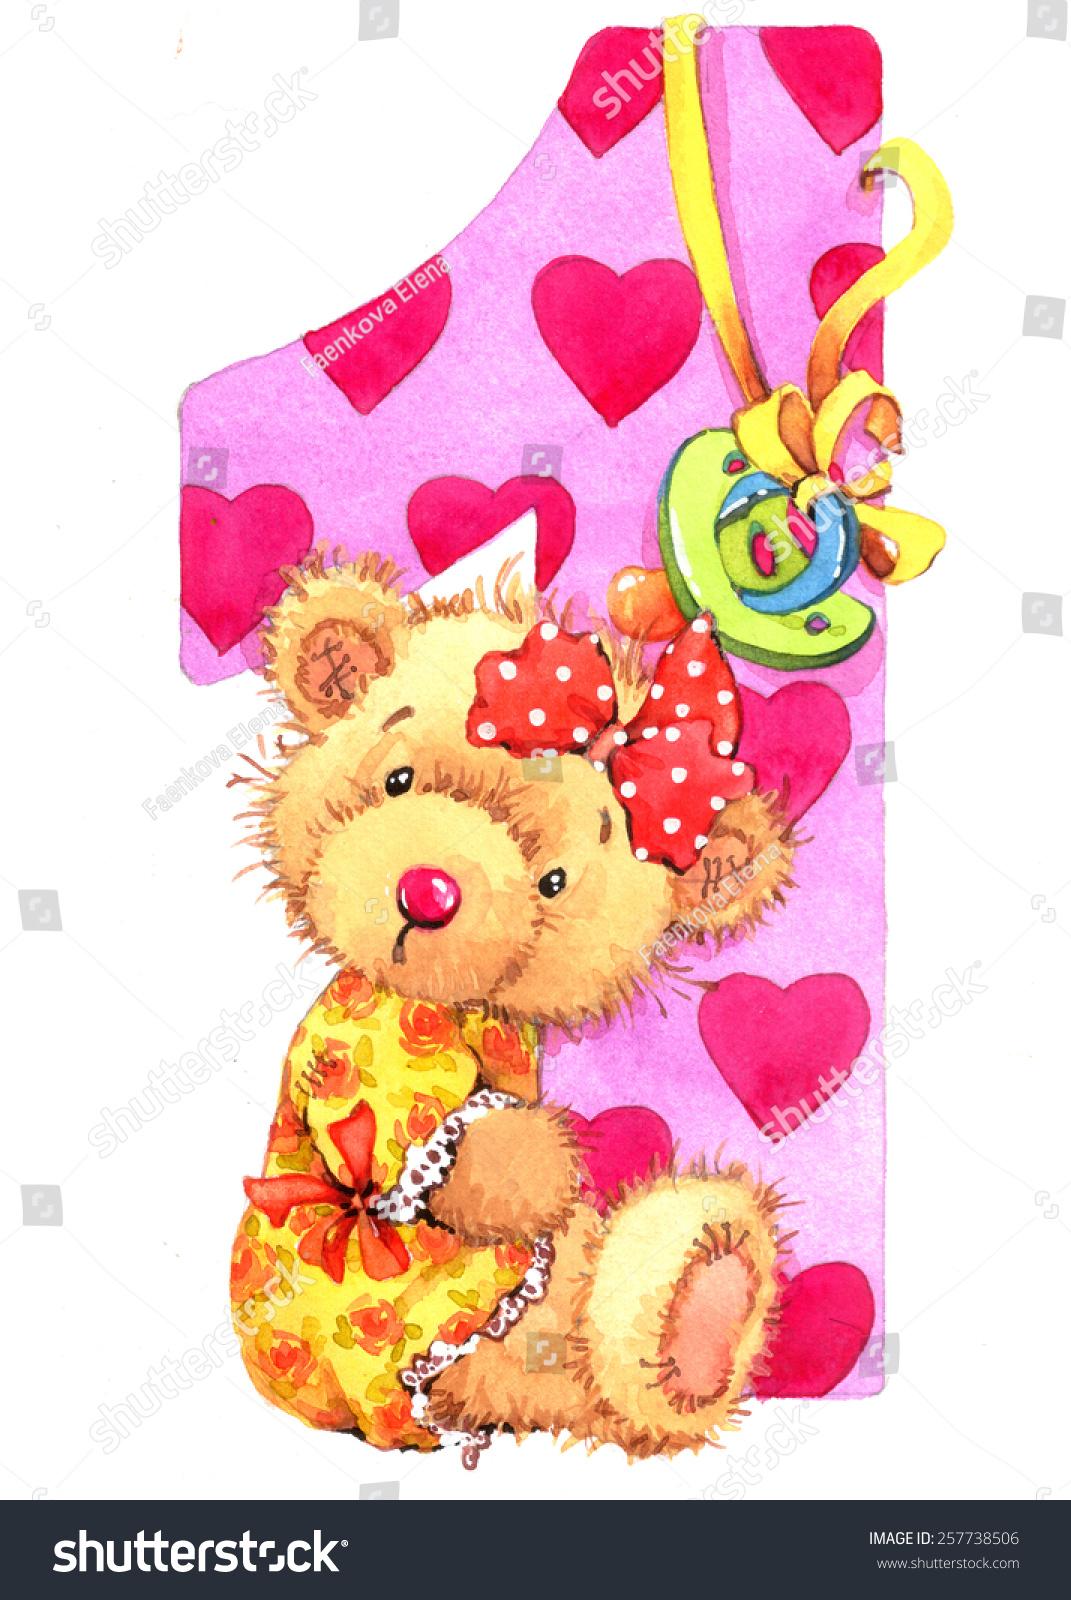 girl teddy bear number one birthdayのイラスト素材 257738506